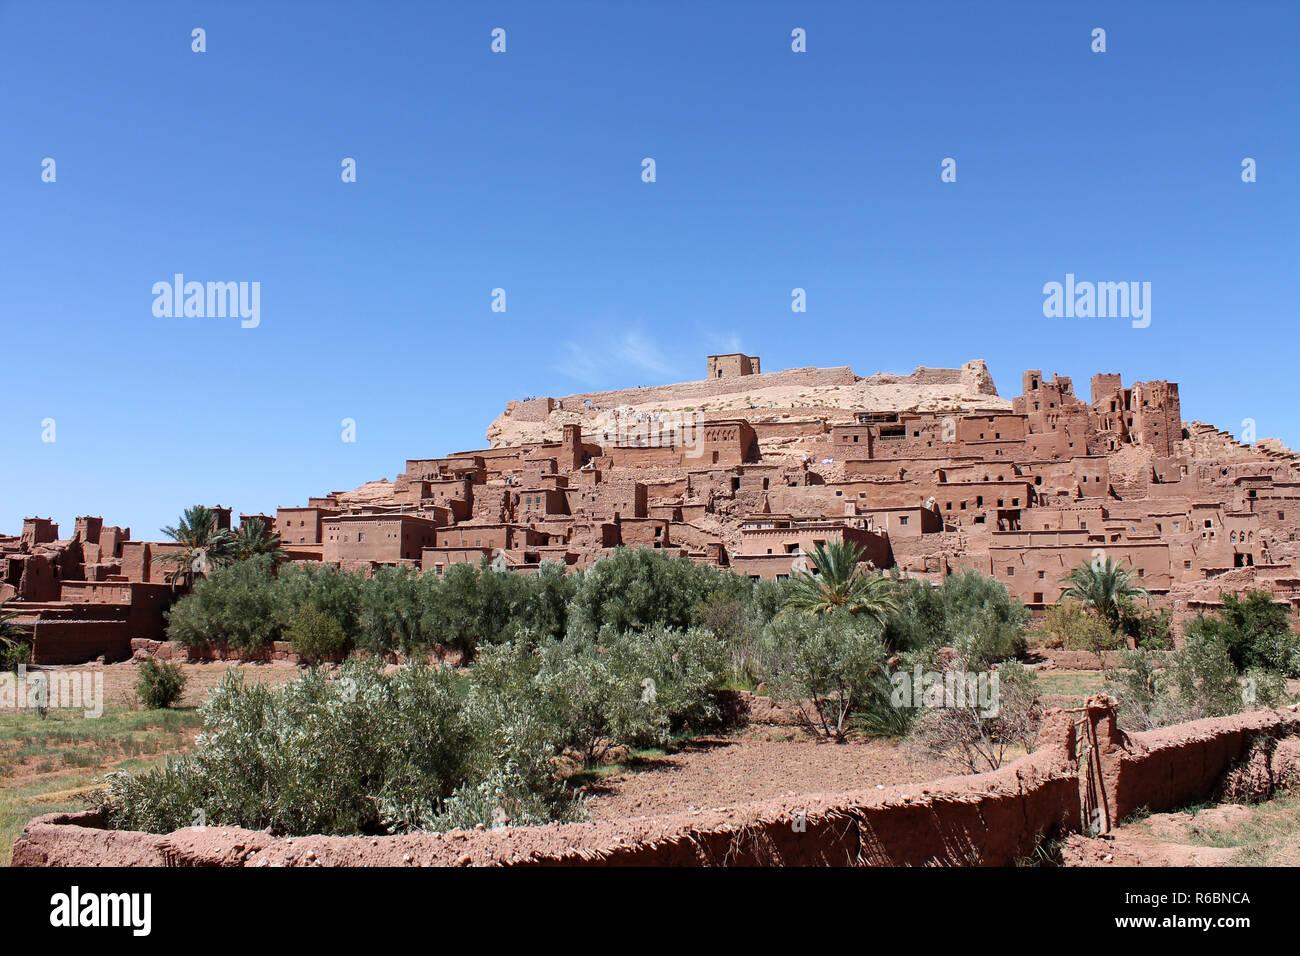 Aït-Ben-Haddou Lehmbauten am Salzfluss - Weltkulturerbe - Stock Image